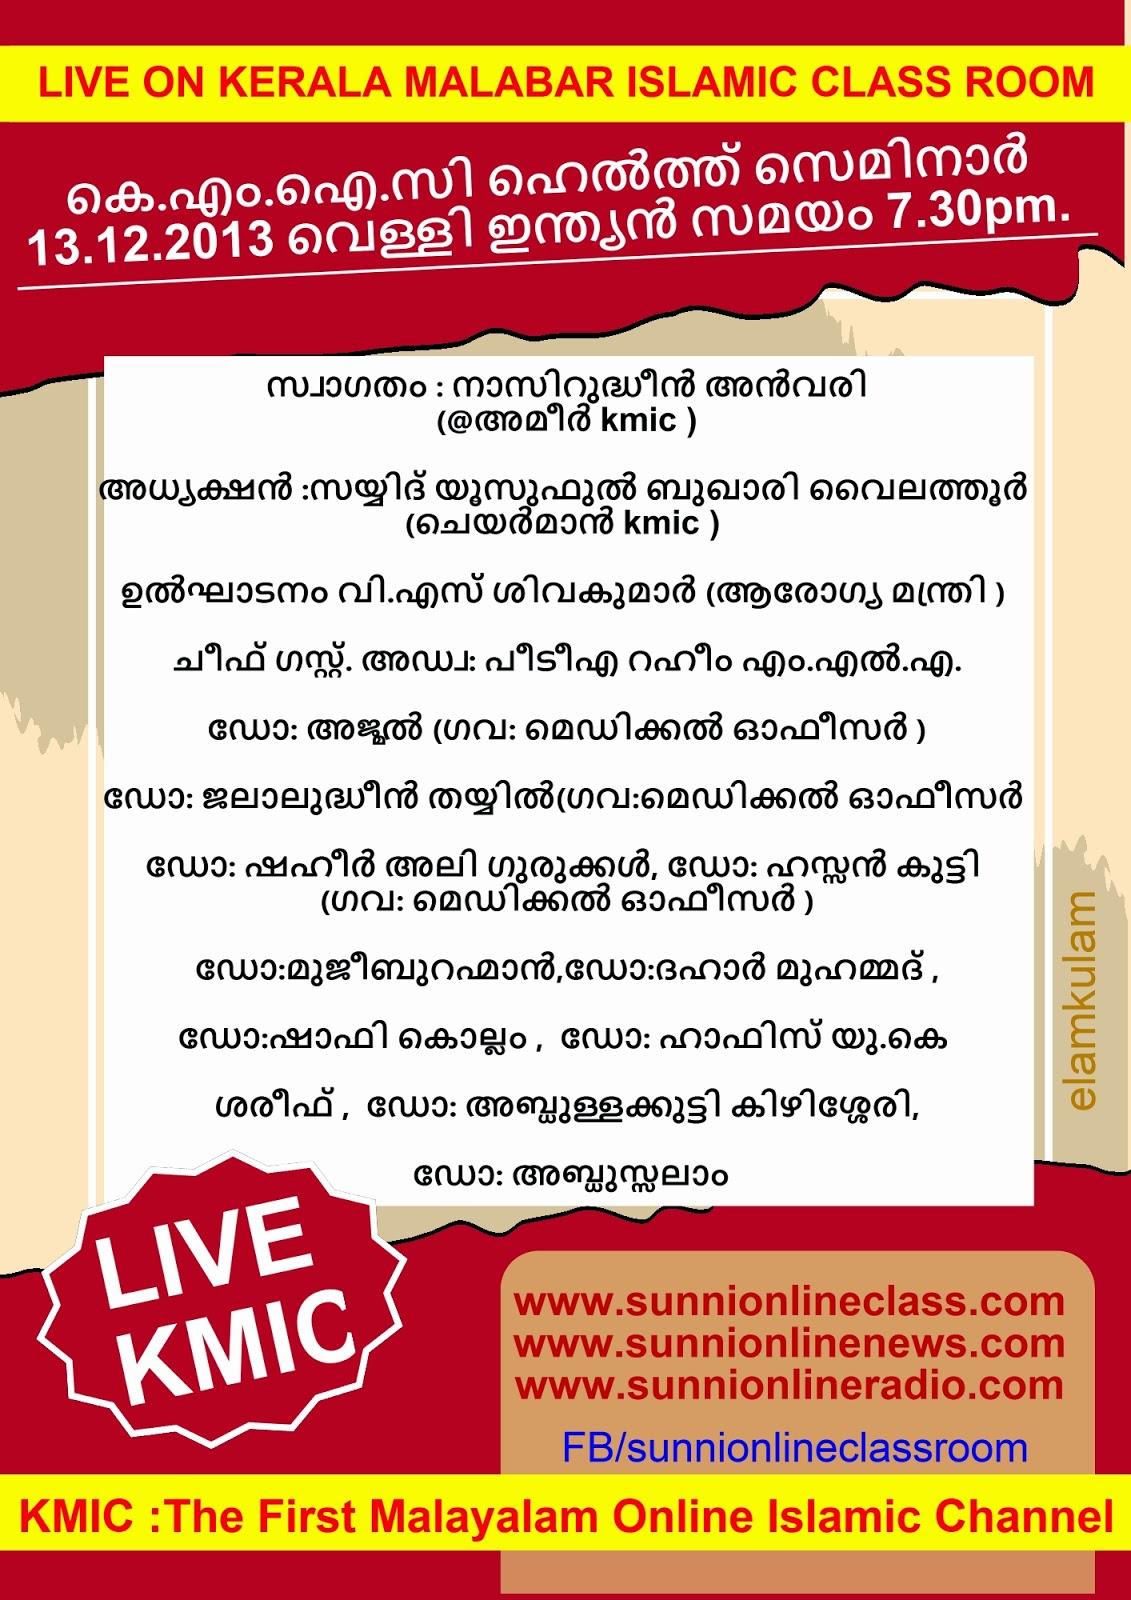 Sunni Online Class Room